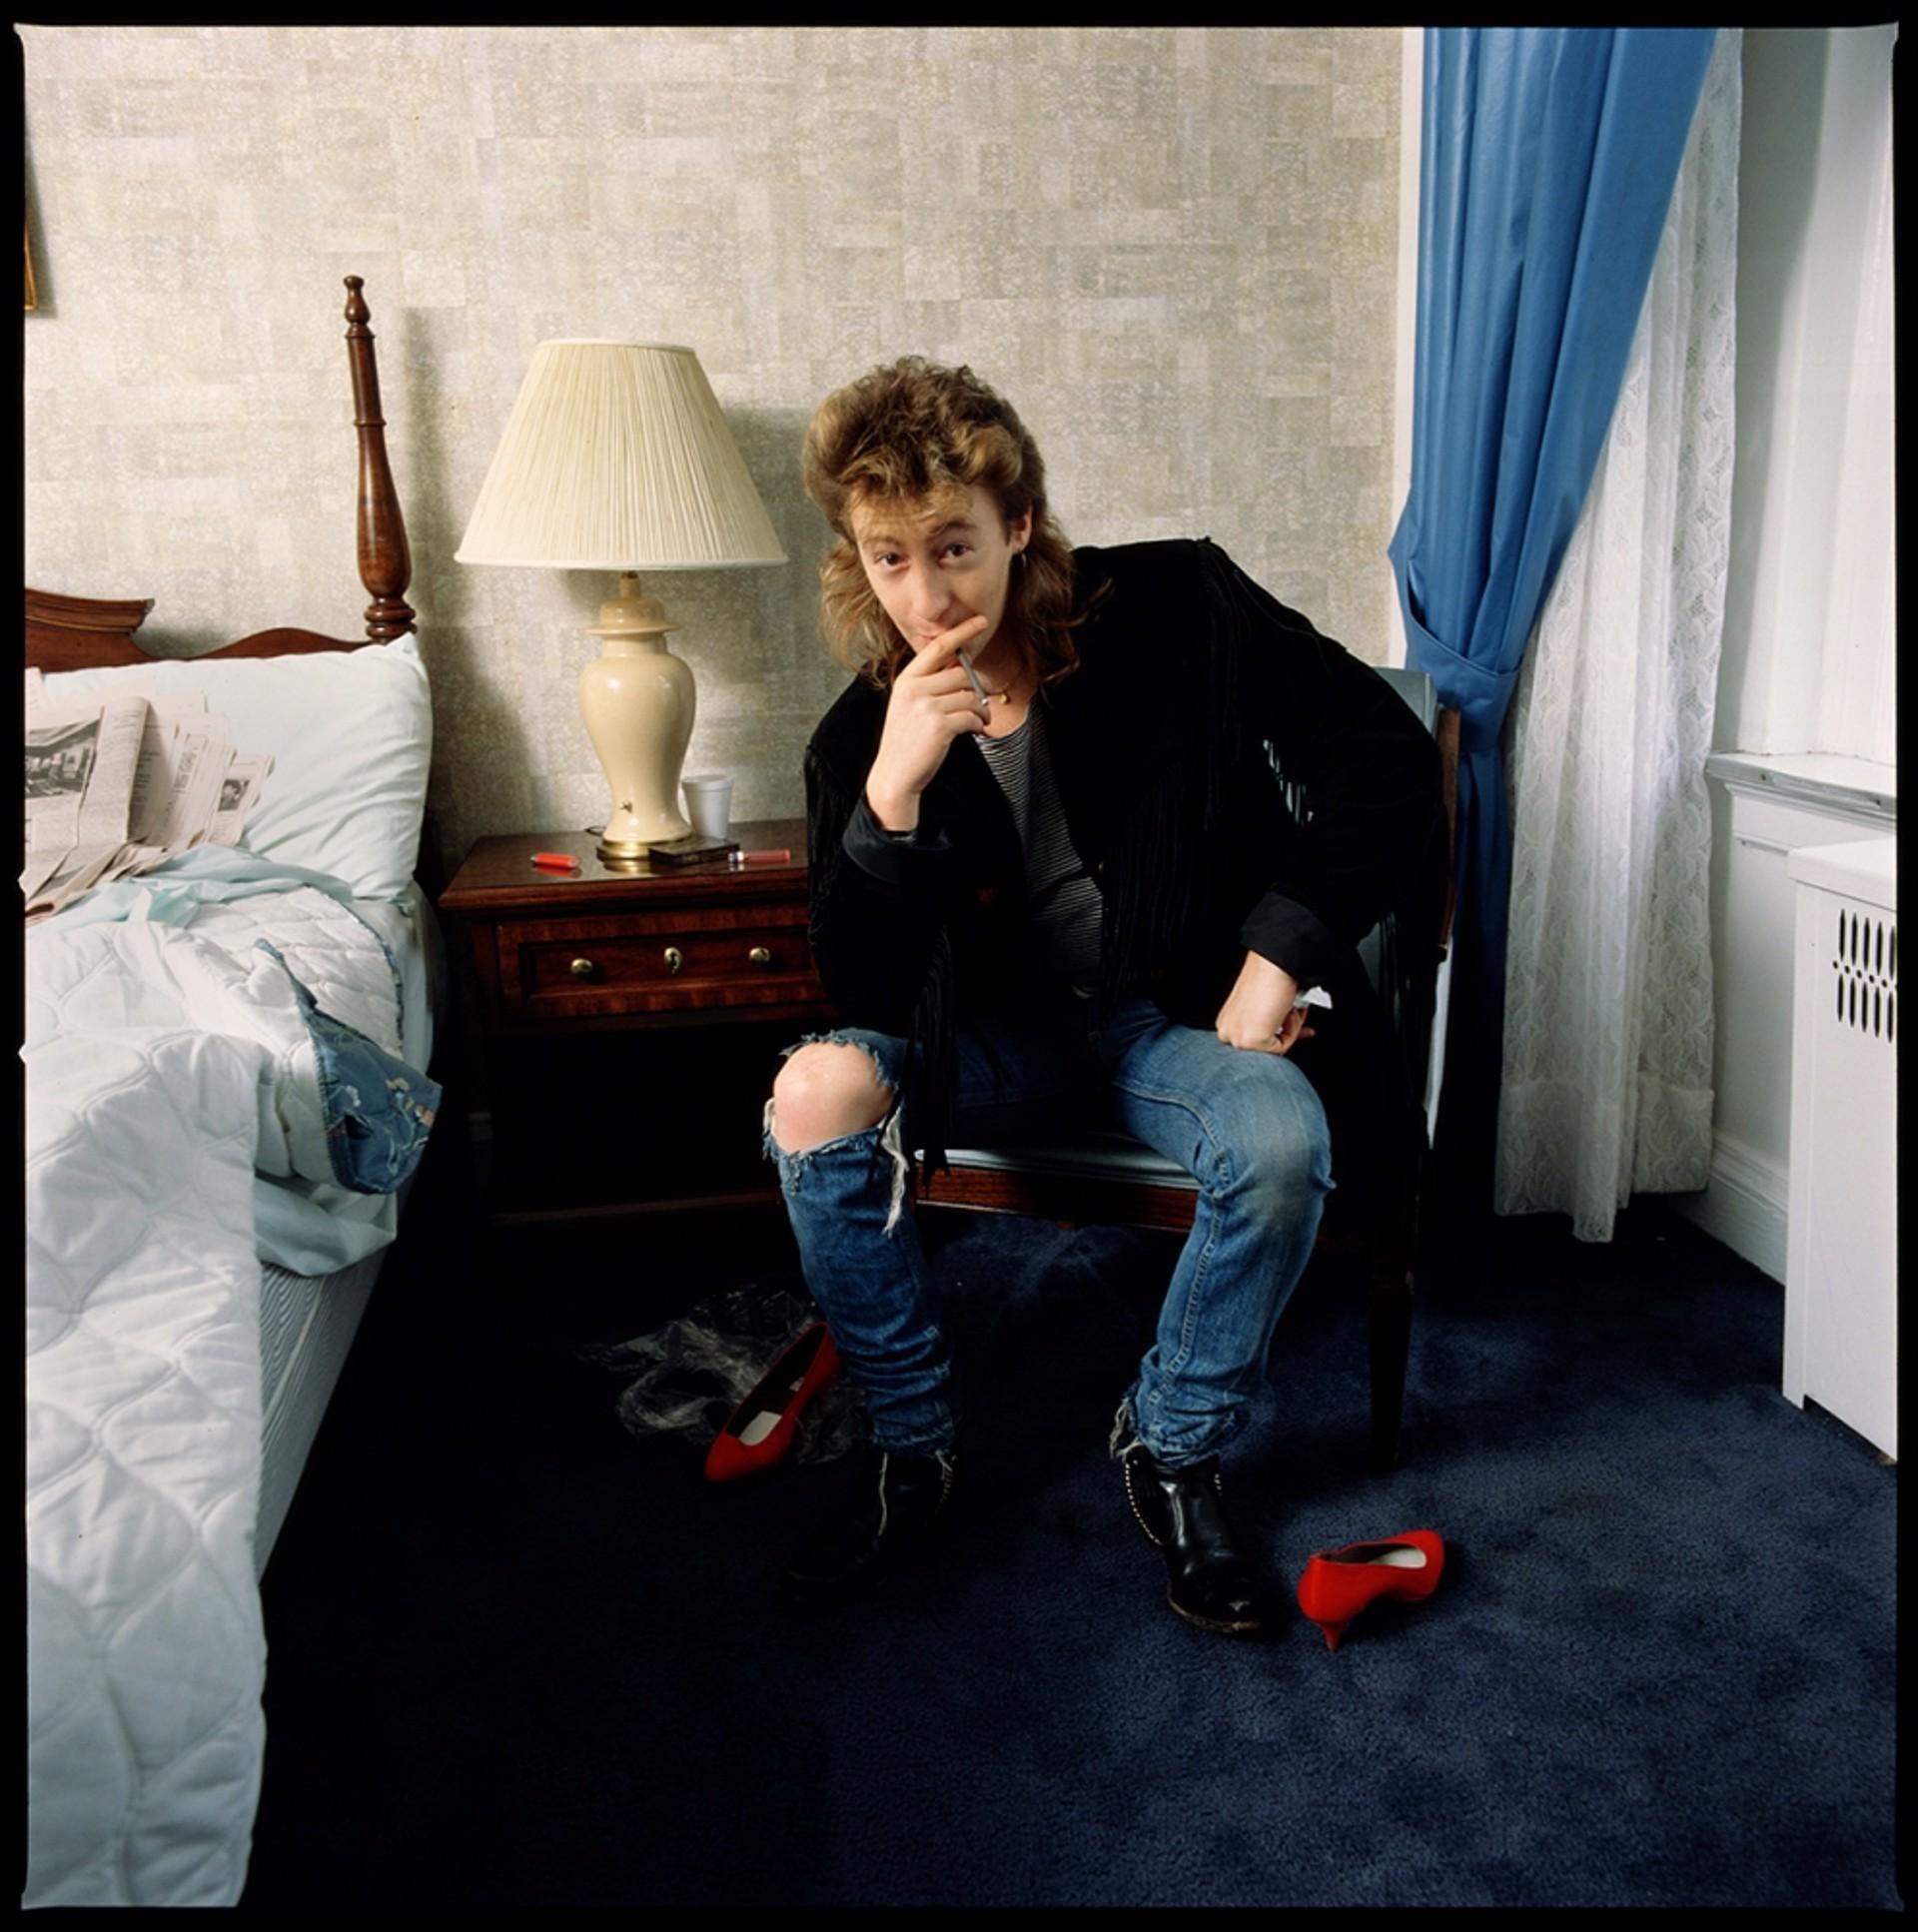 86044 Julian Lennon Bedroom Color by Timothy White